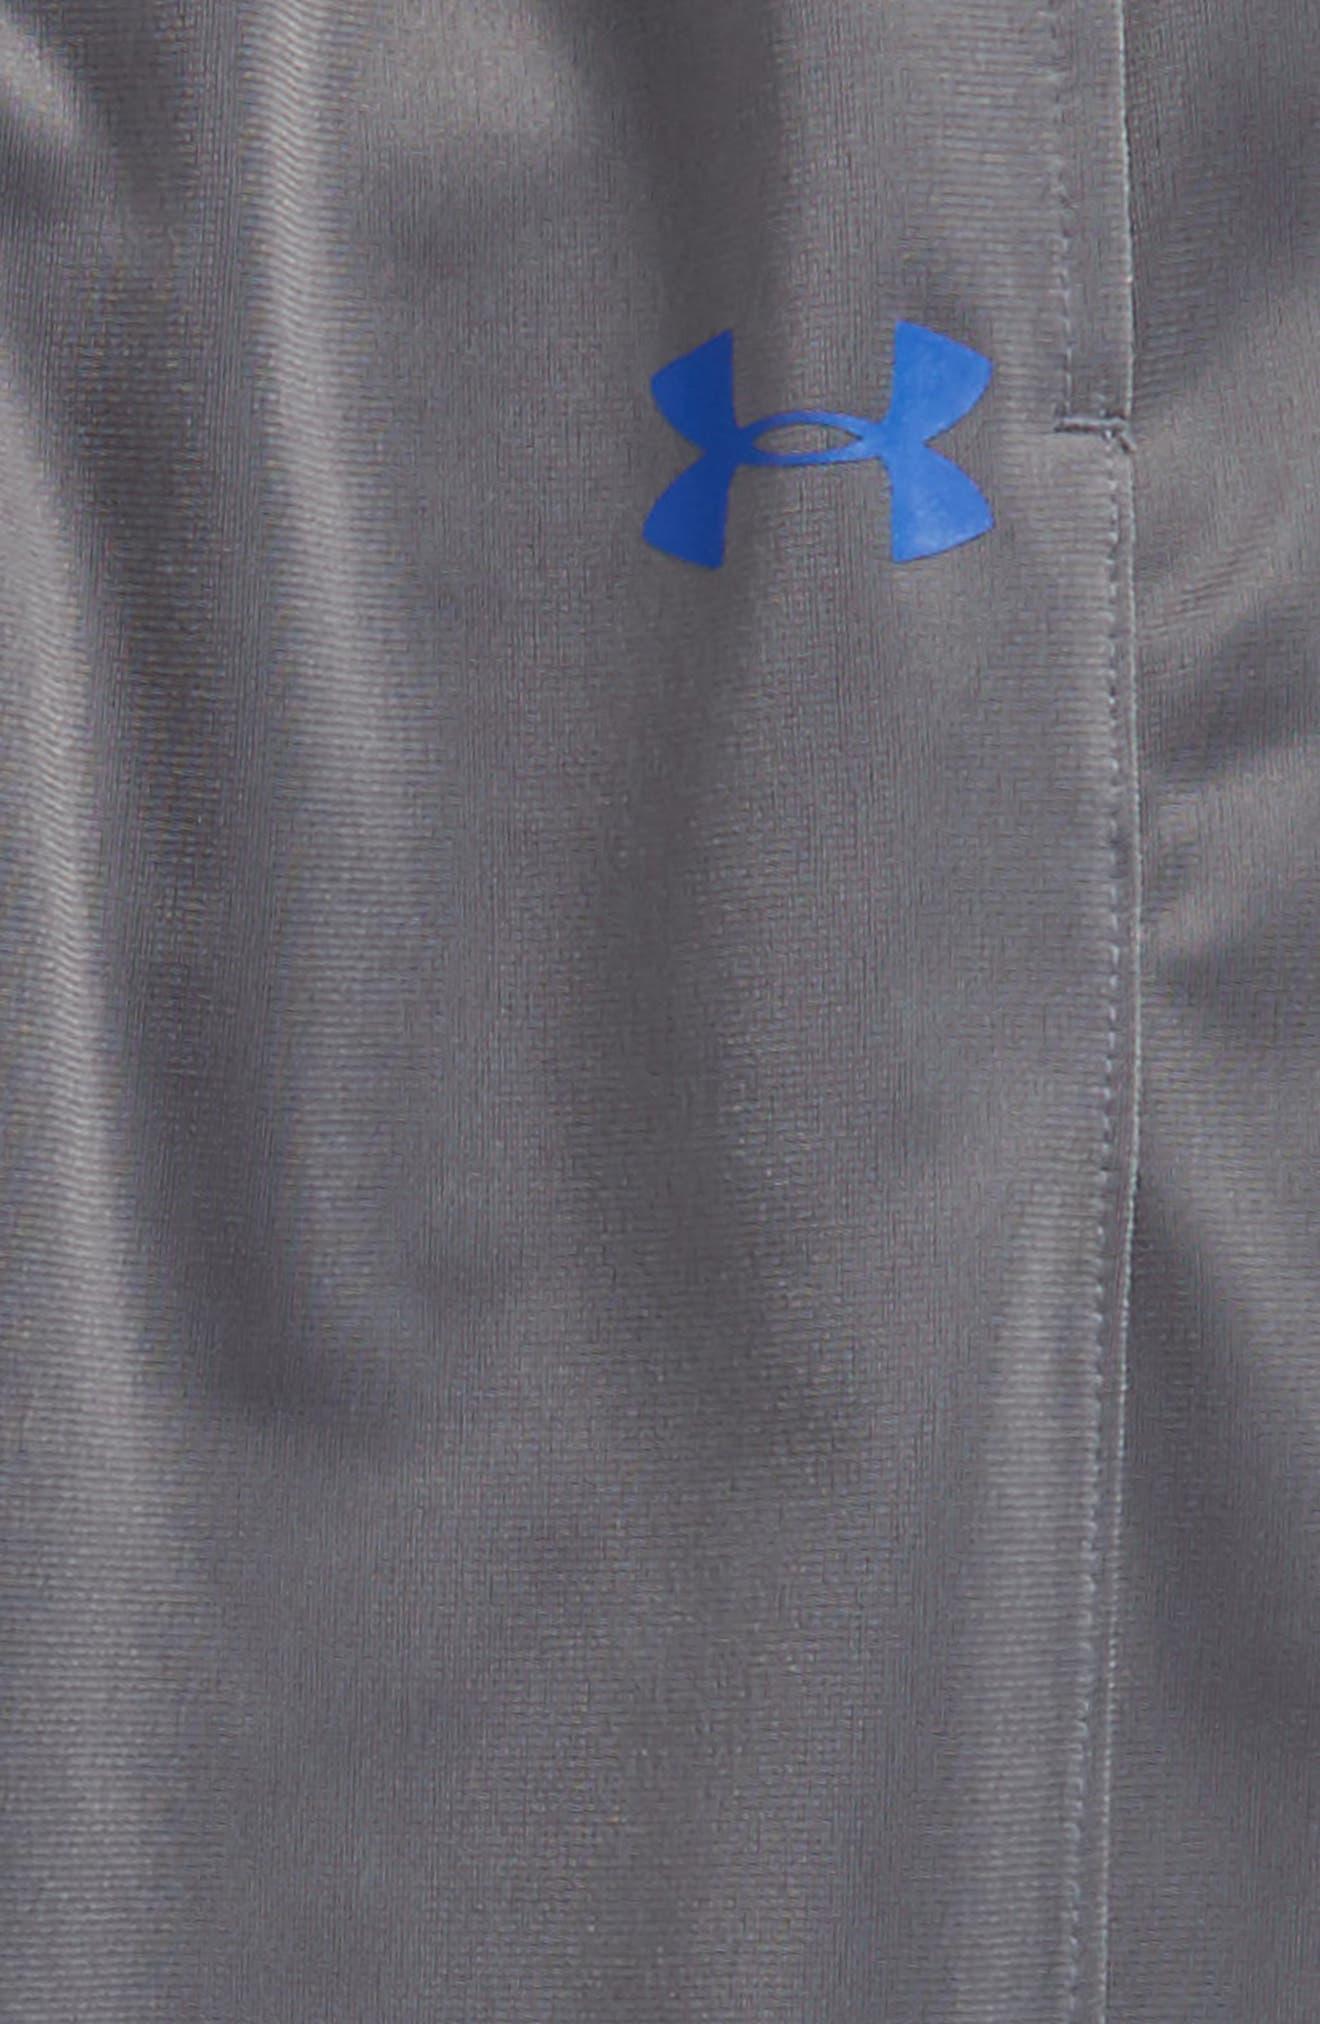 Brawler 2.0 Pants,                             Alternate thumbnail 2, color,                             Graphite/ Royal